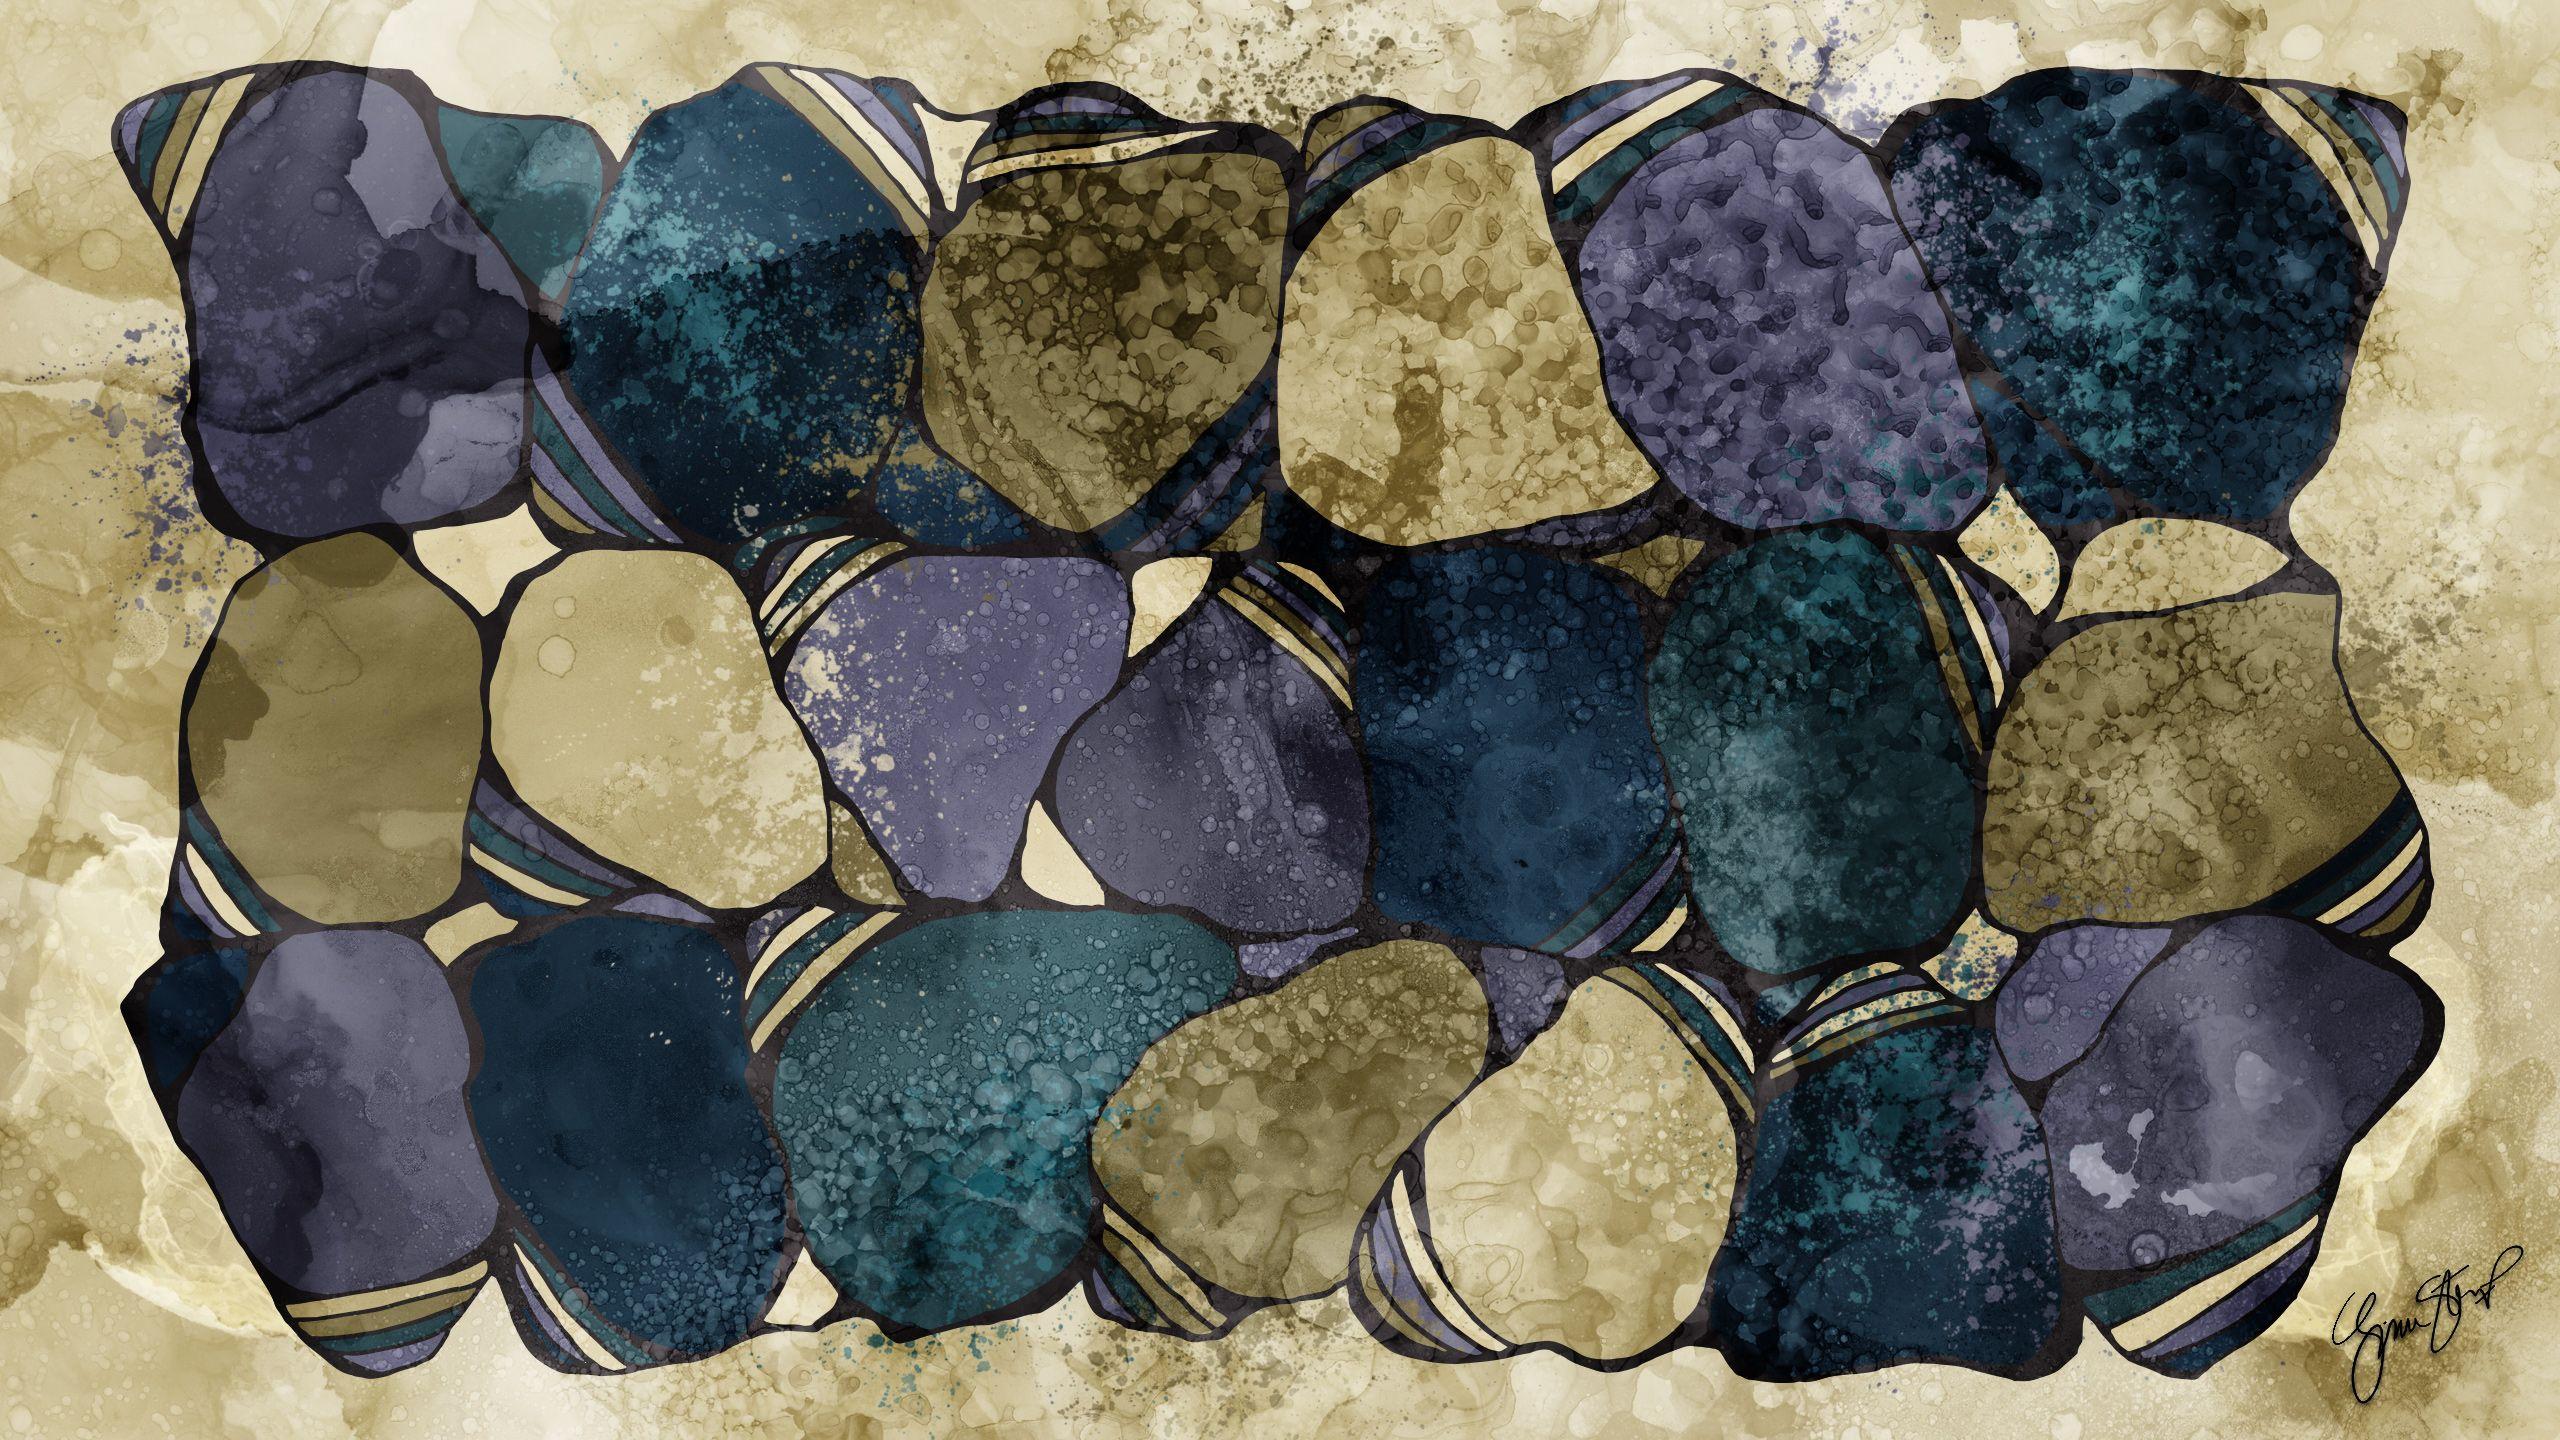 SearchEveryShore by Gina Startup #abstractart www.starwalt.com